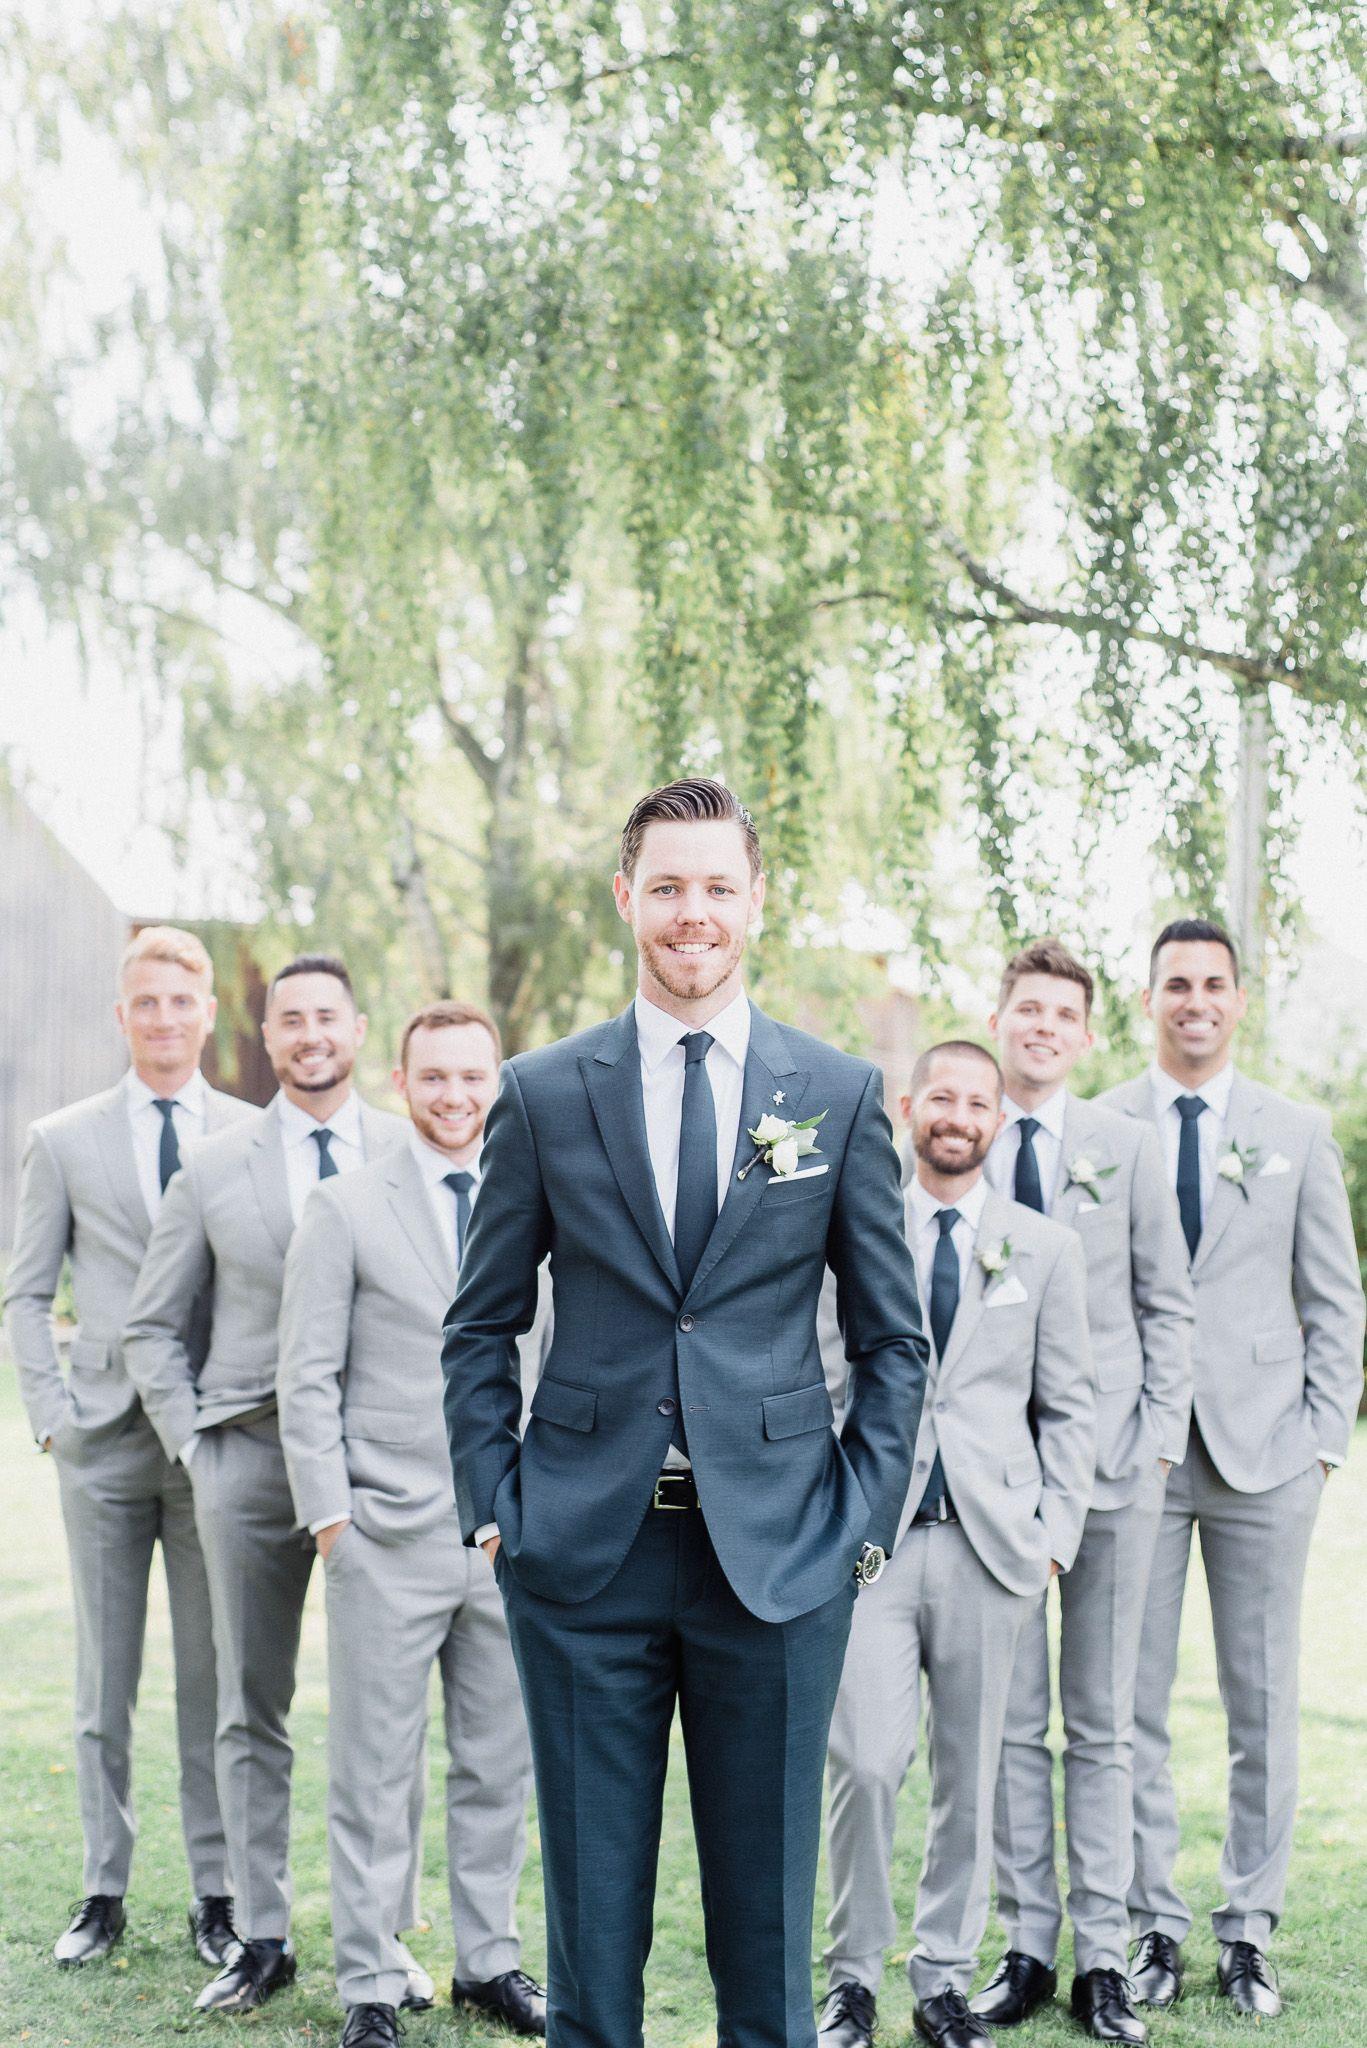 Earth to Table The Farm Wedding in Flamborough, Ontario